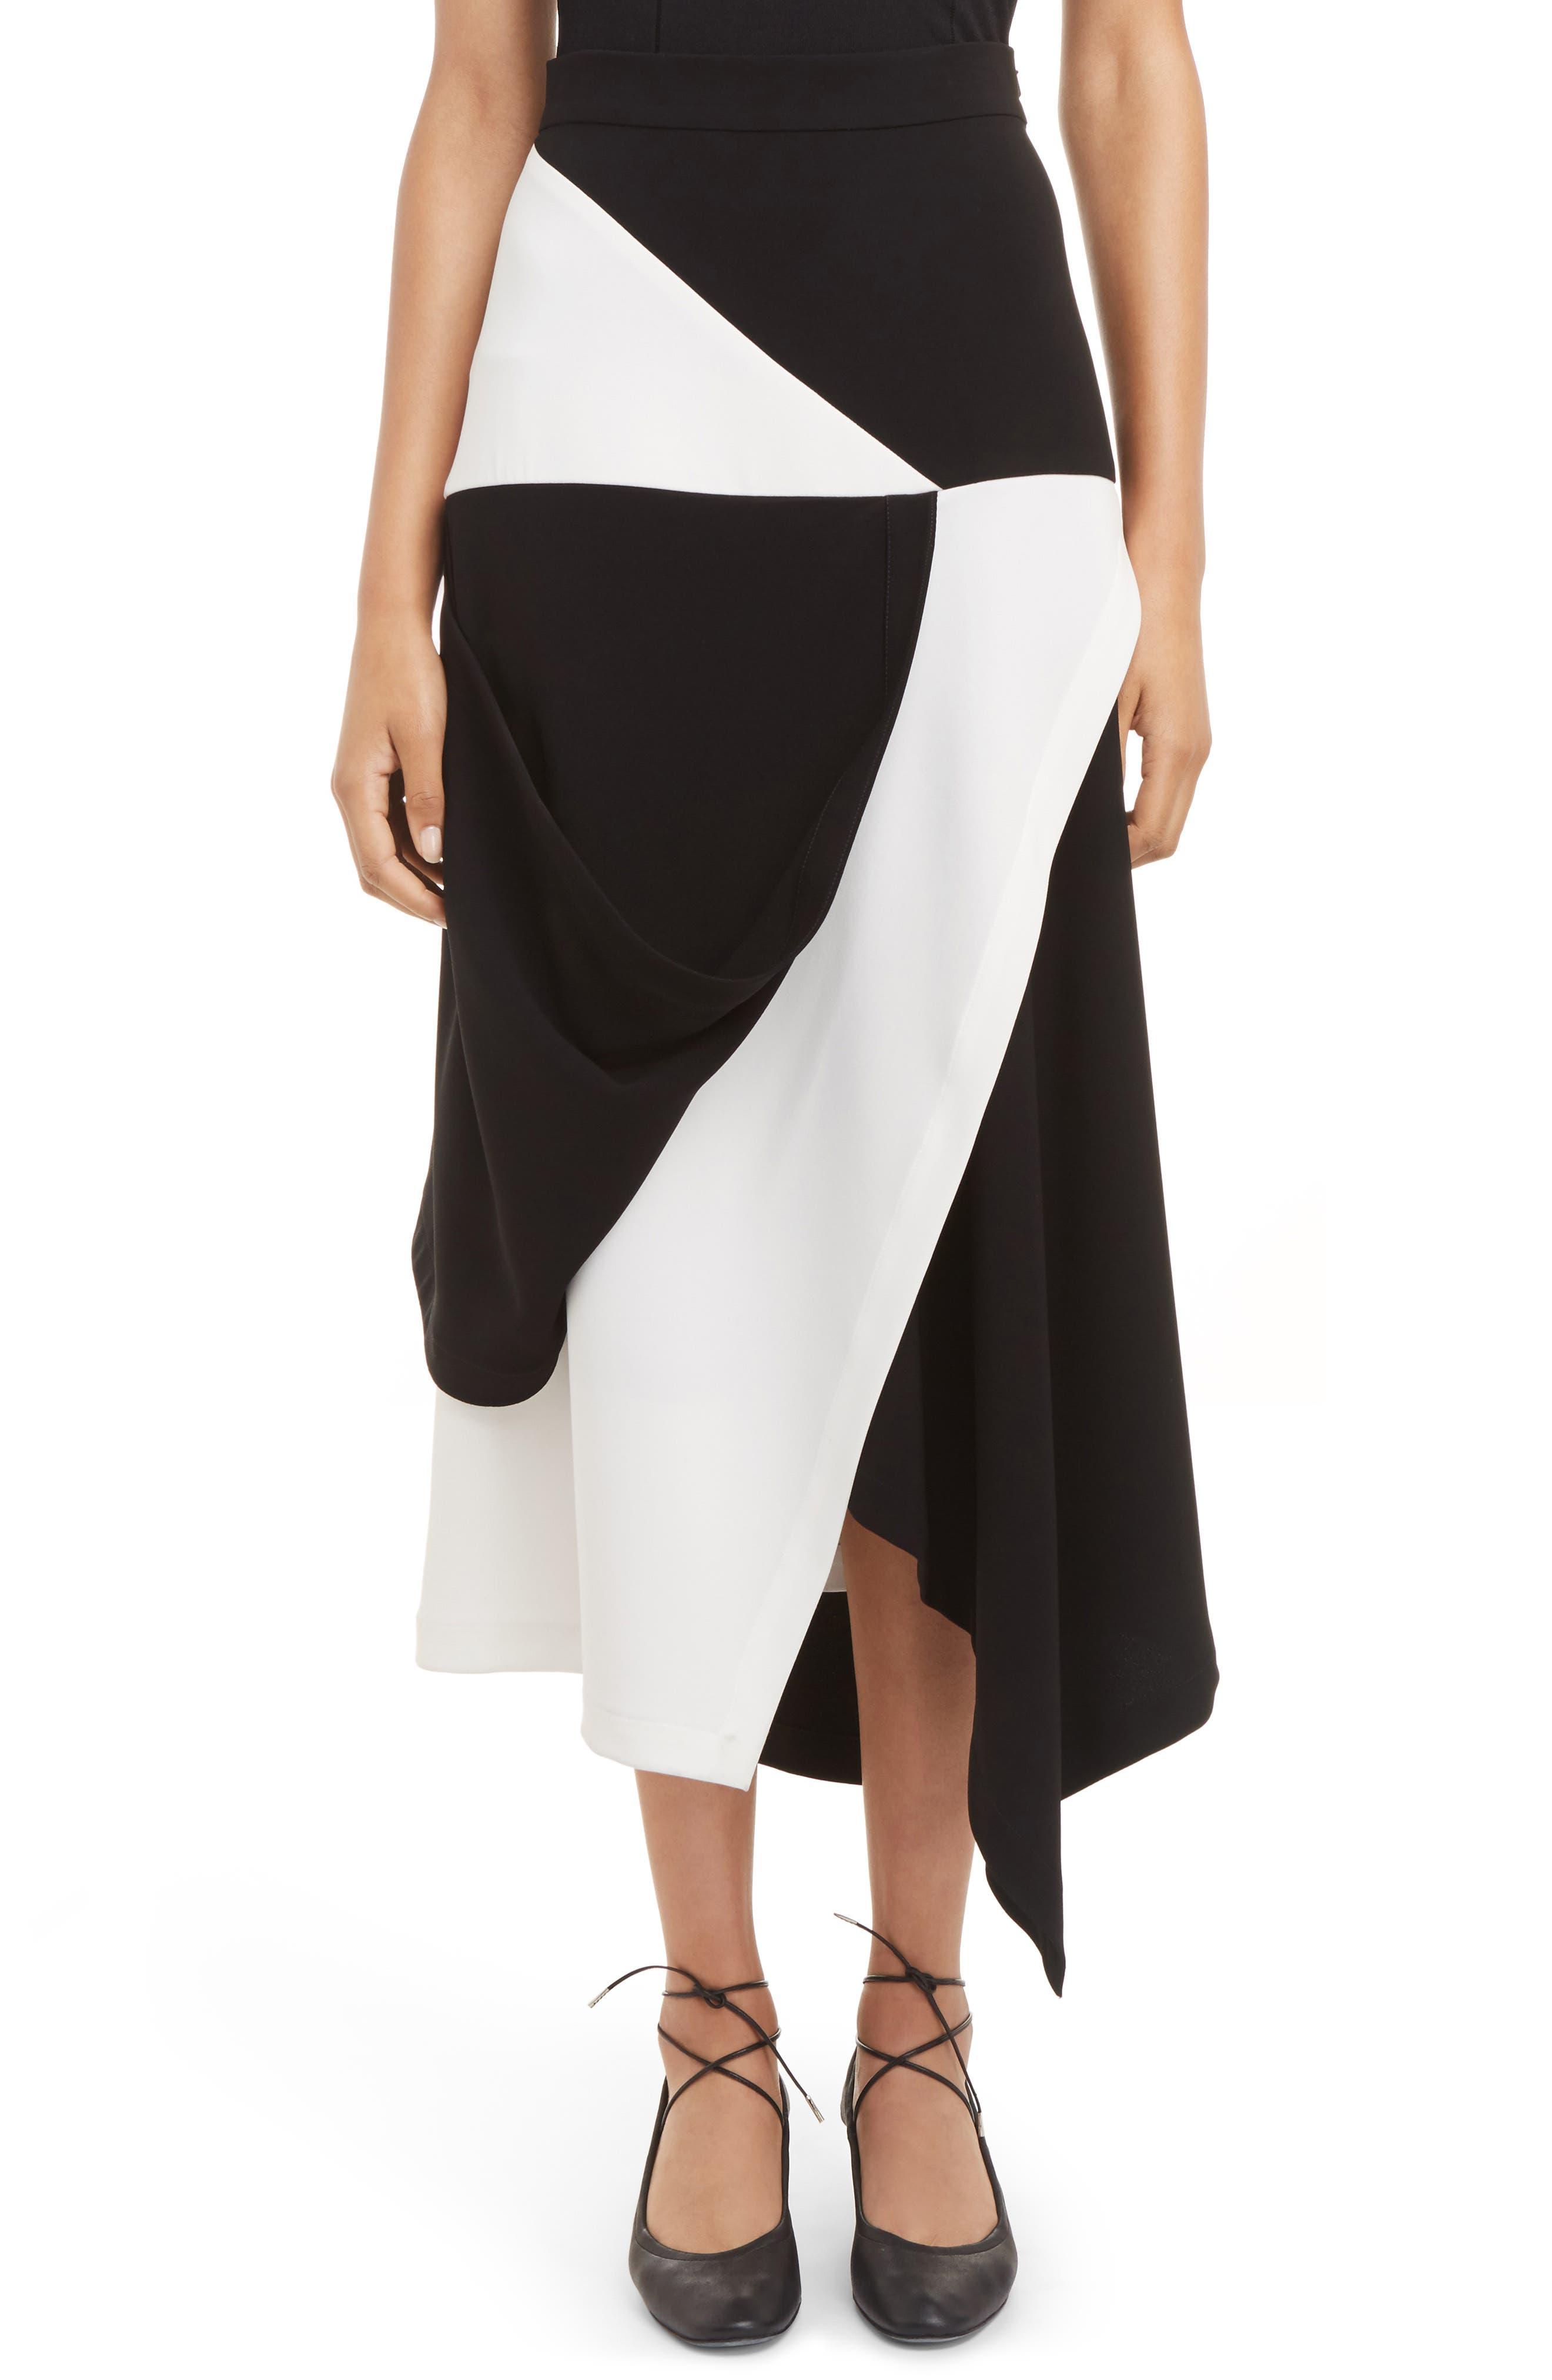 J.W.ANDERSON Asymmetrical Hem Maxi Skirt